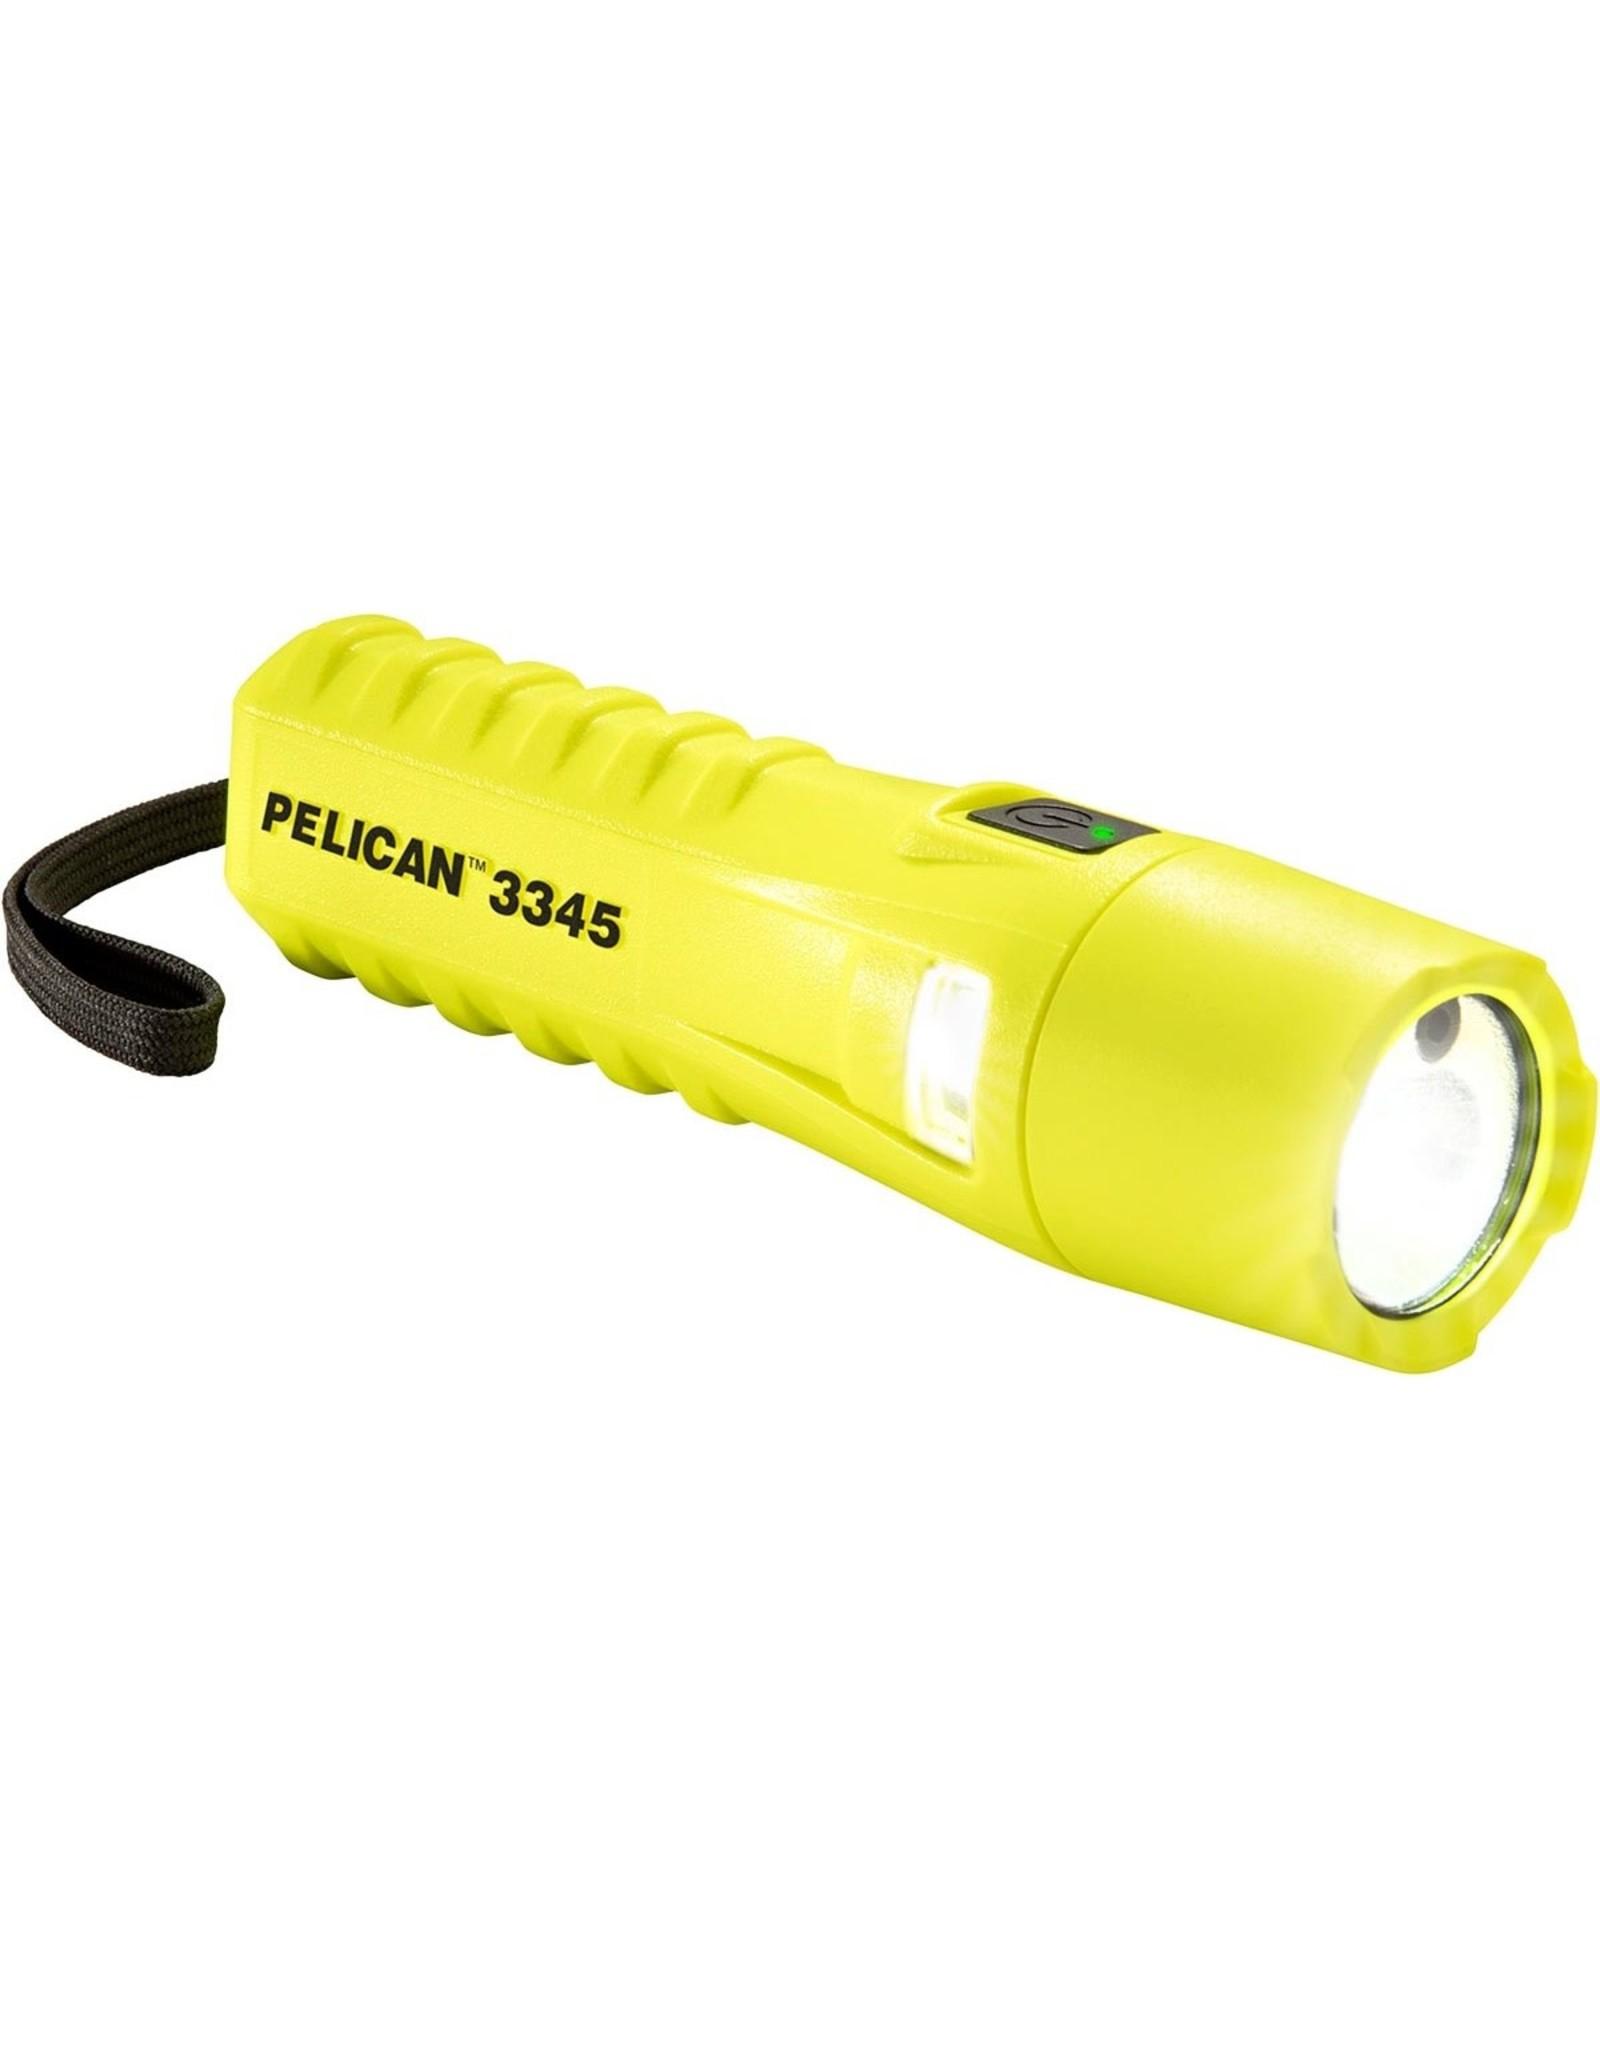 Pelican Pelican Intrinsically Safe 3345 Flashlight